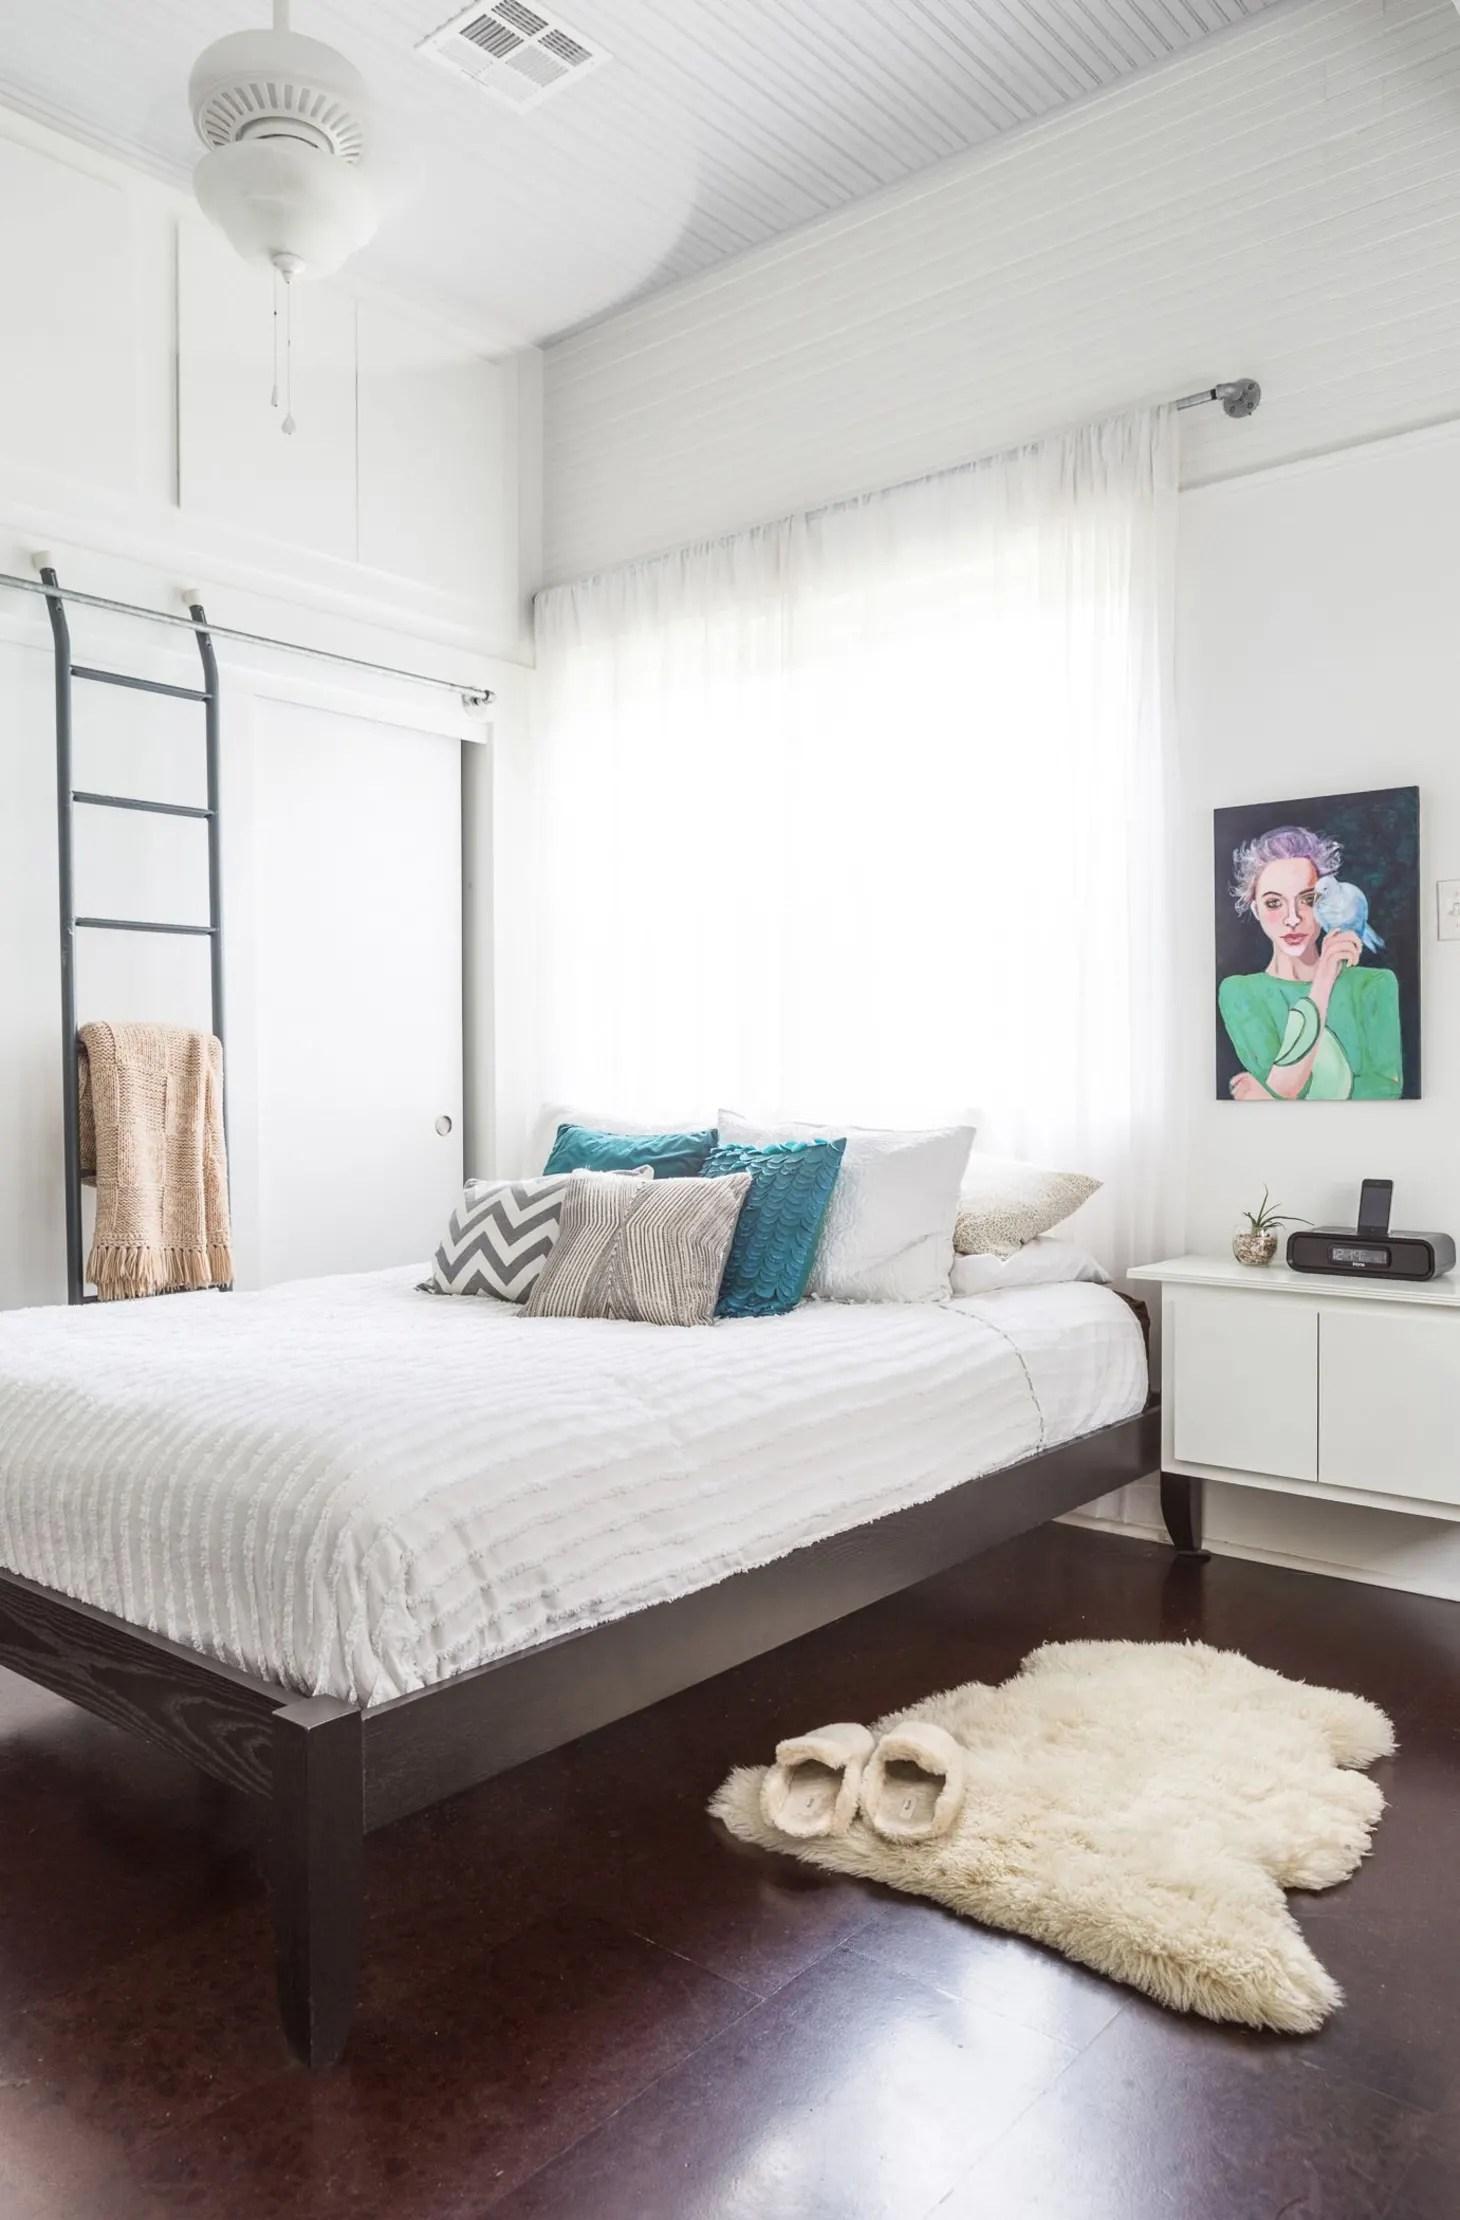 Minimalist Bedroom Ideas (That Aren't Boring) | Apartment ... on Minimalist Bedroom Ideas  id=42635